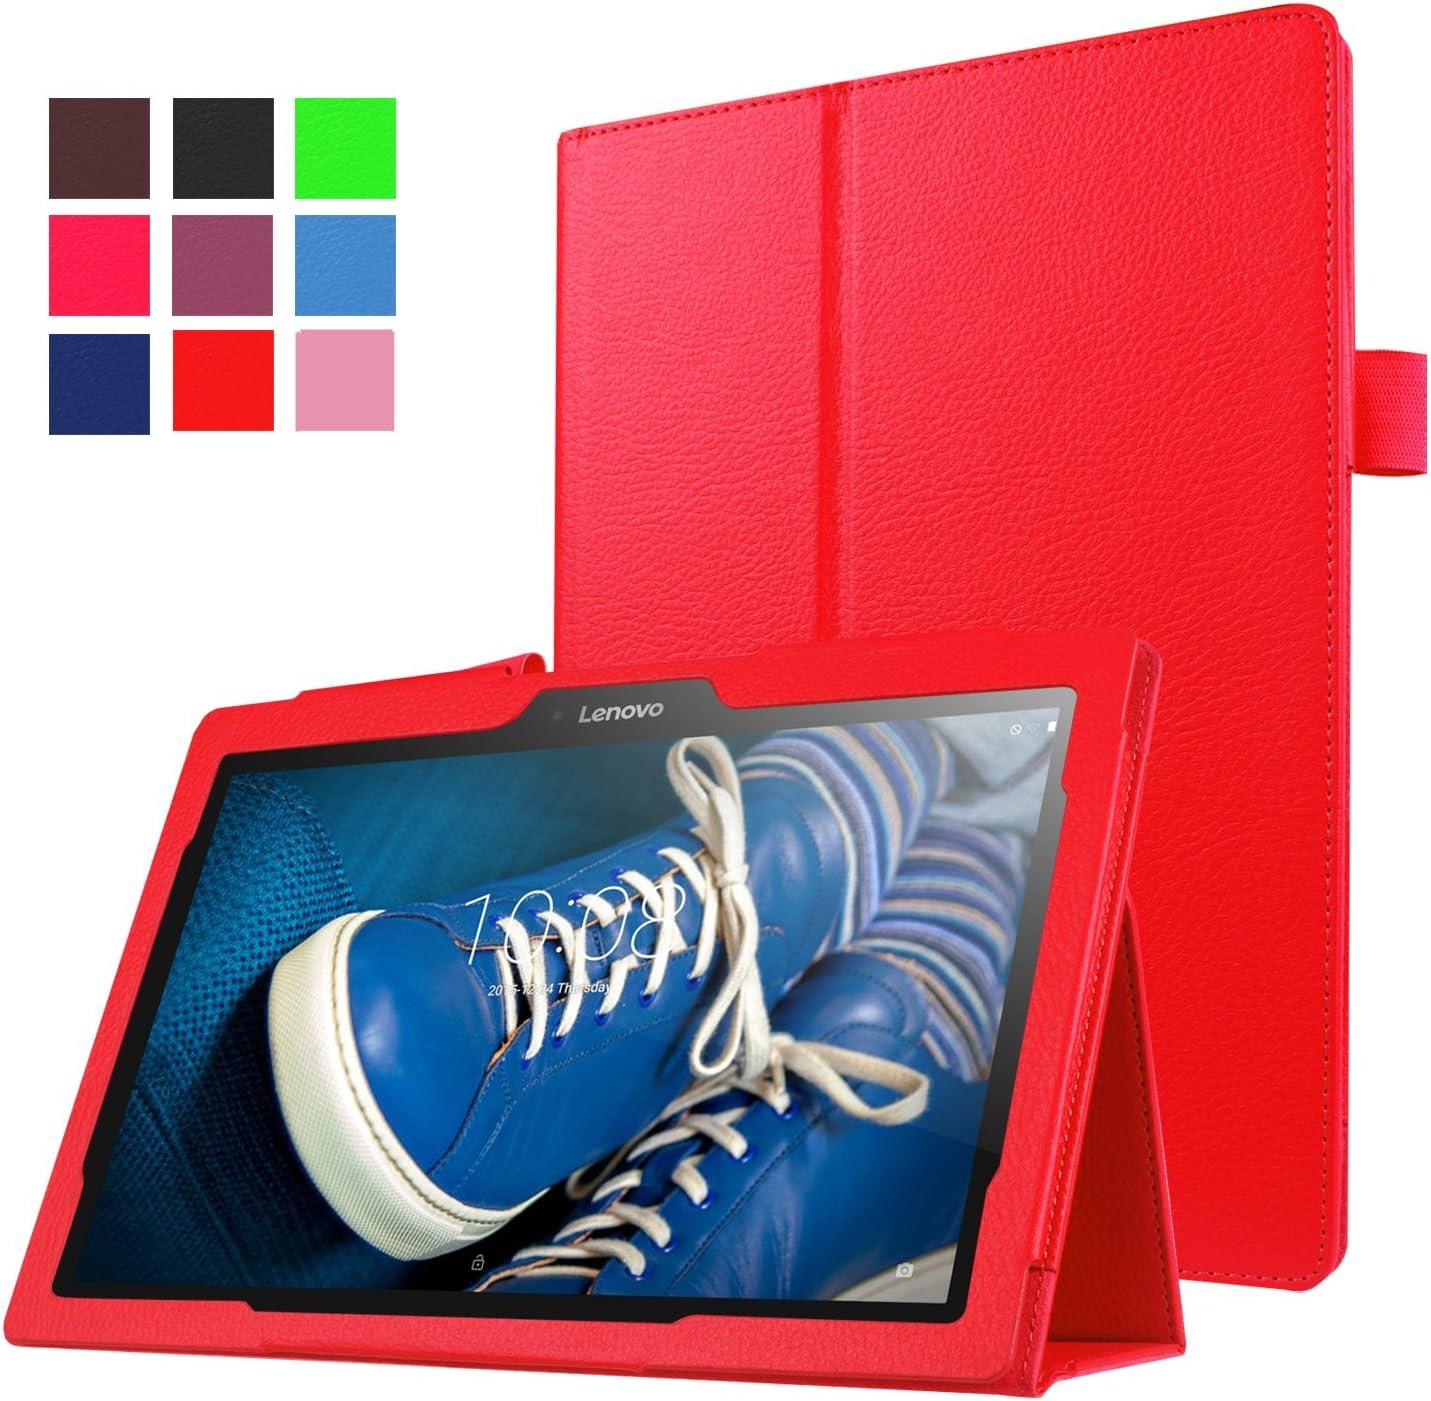 "Asng Lenovo Tab 2 A10/TAB-X103F Tab 10 Case - Slim Folding Stand Cover Smart Case for Lenovo Tab 3 10 Plus/TB-X103F/Tab2 A10-70/Tab2 A10-30/Tab2 X30F/Tab 3 10 Business TB3-X70F 10.1"" Tablet (Red)"